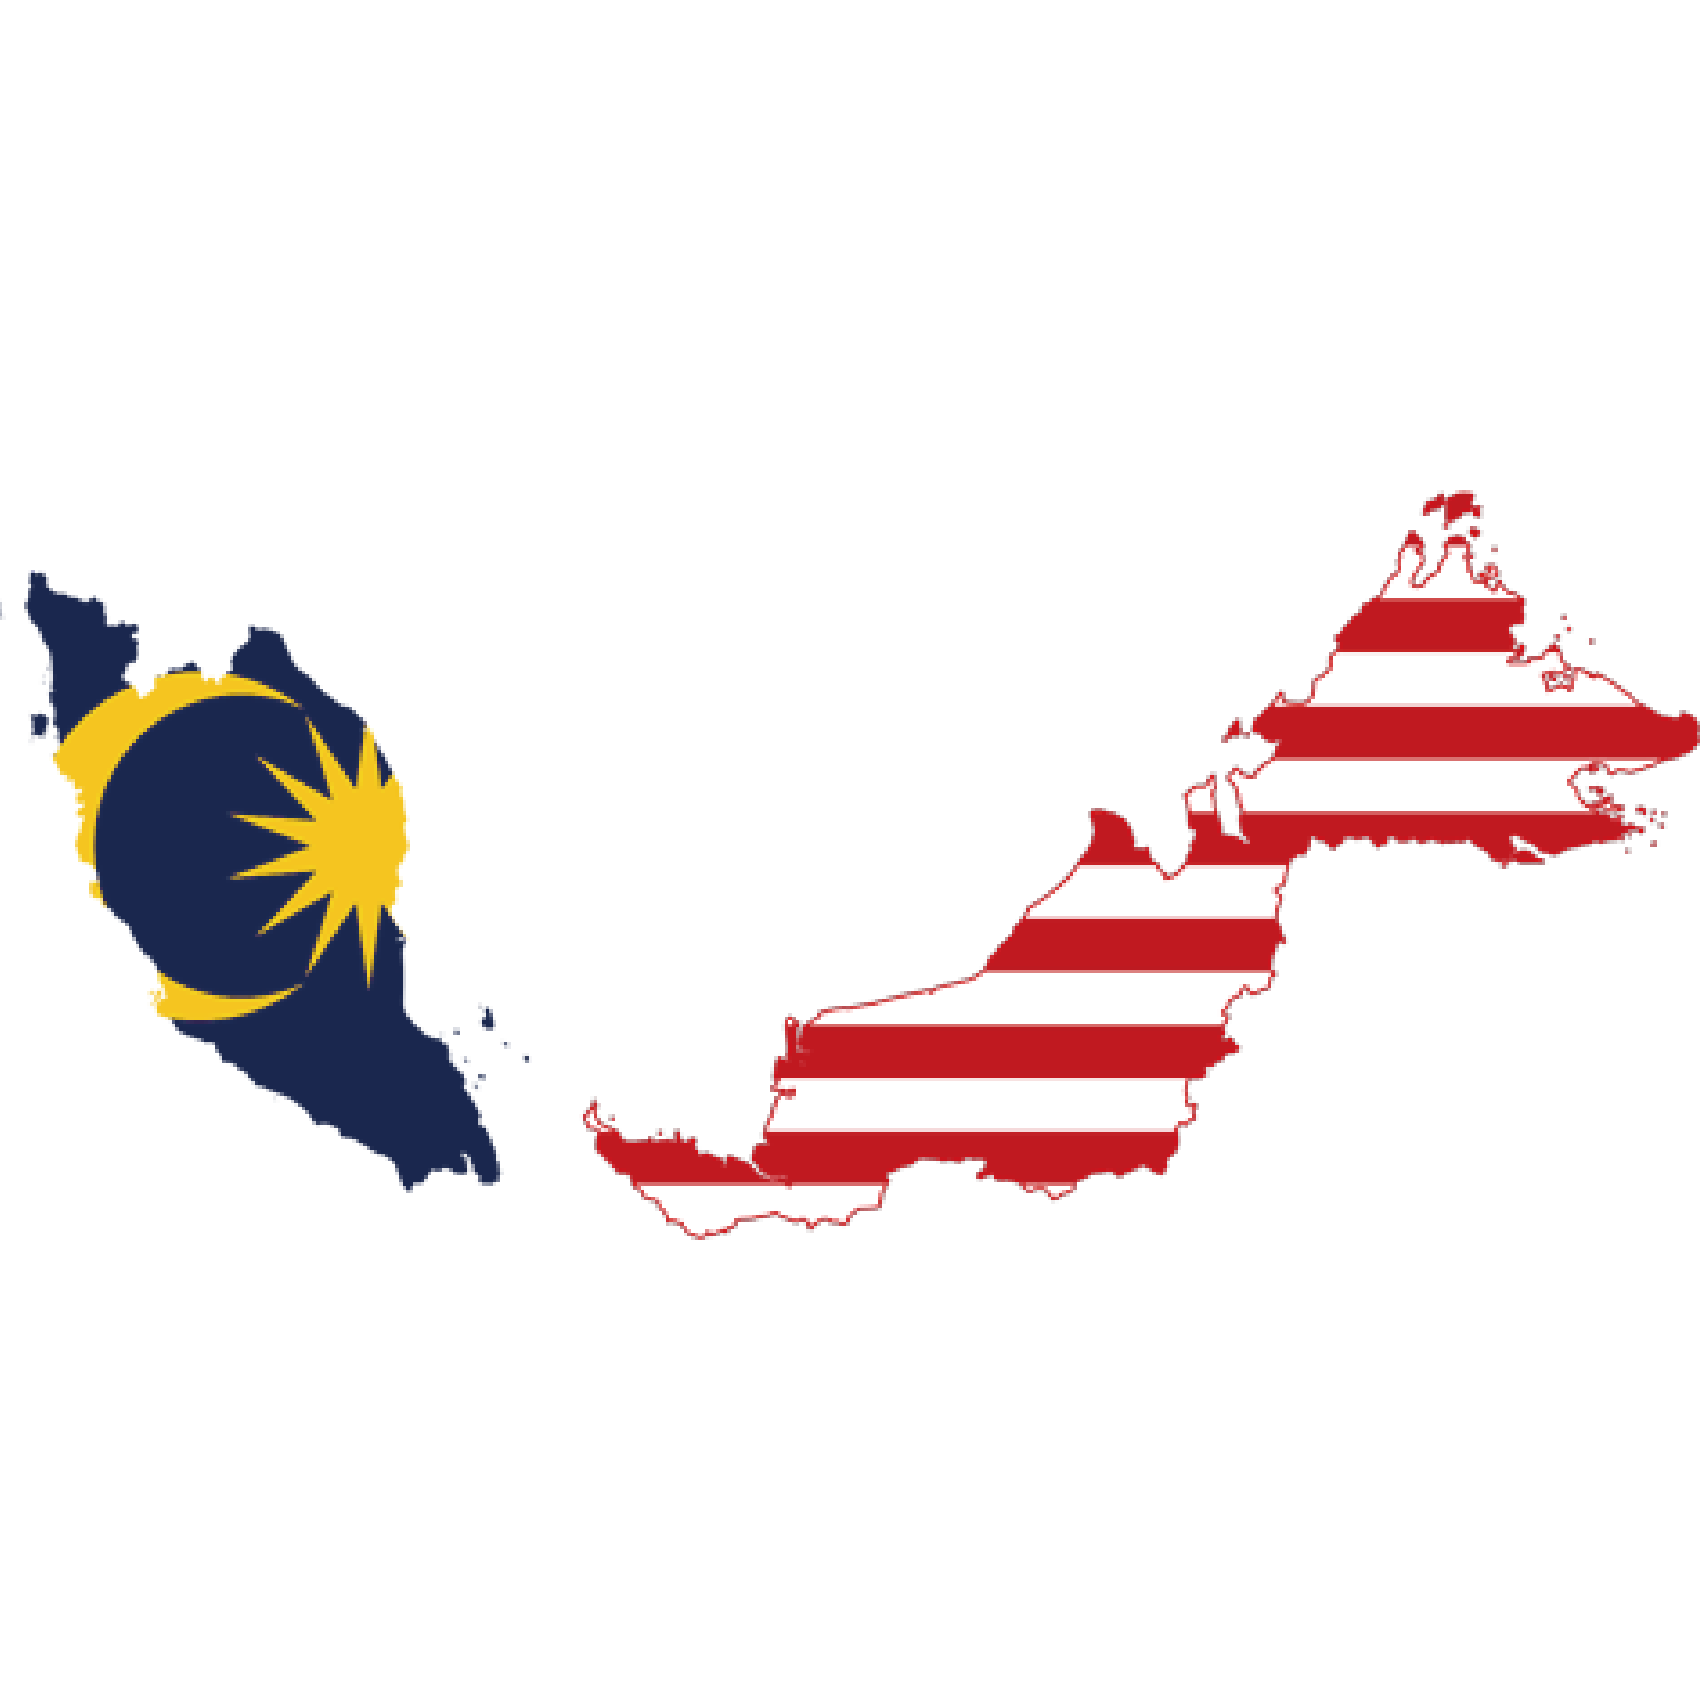 Flag of Malaysia, the partner of barskorea.